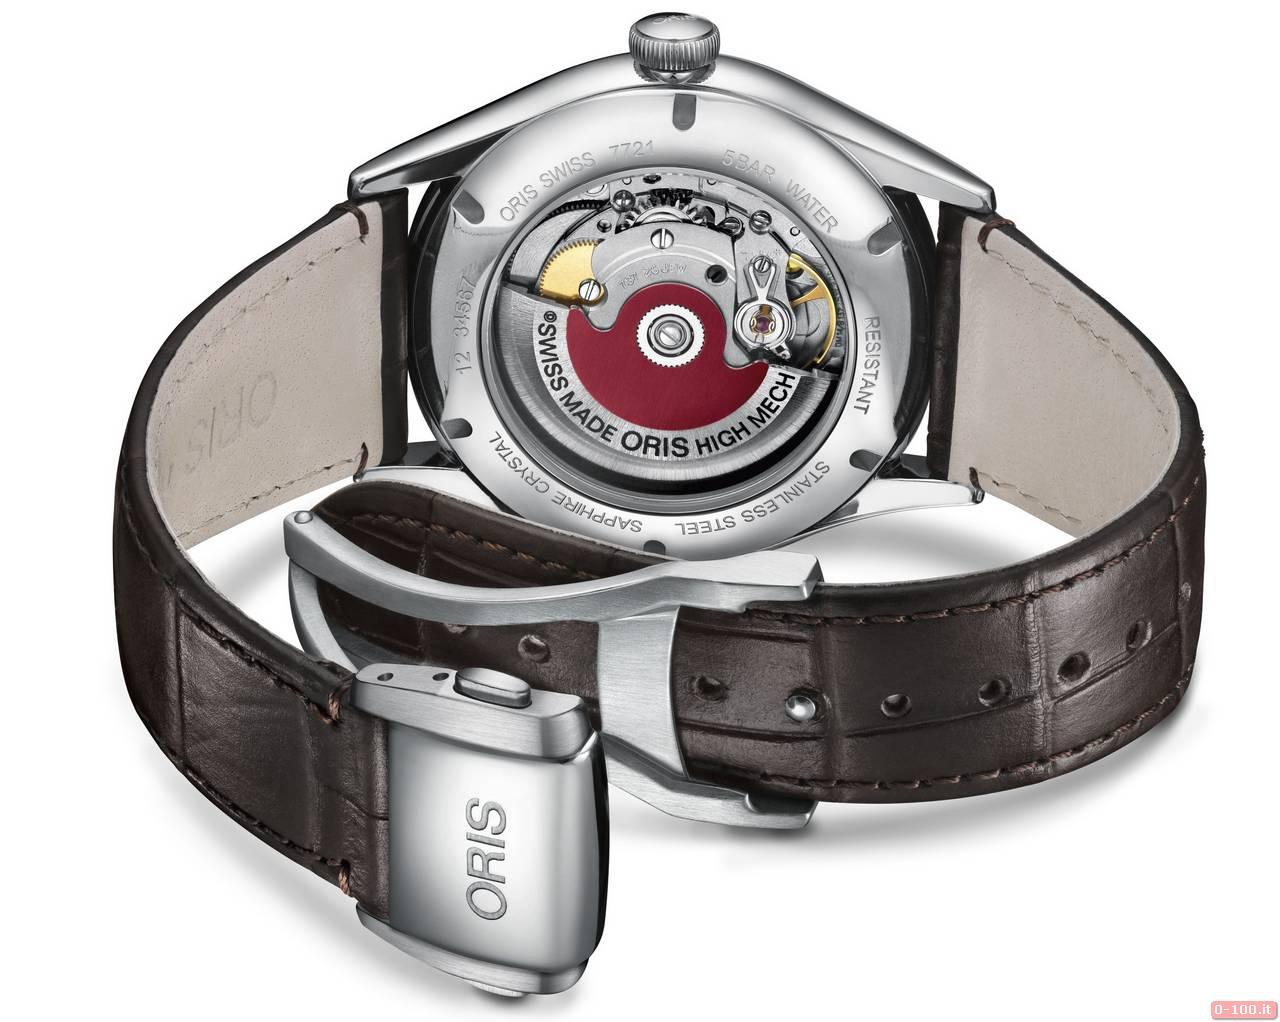 anteprima-baselworld-2016-oris-artelier-chronometer-ref-01-737-7721-4031-ls-prezzo-price_0-1002